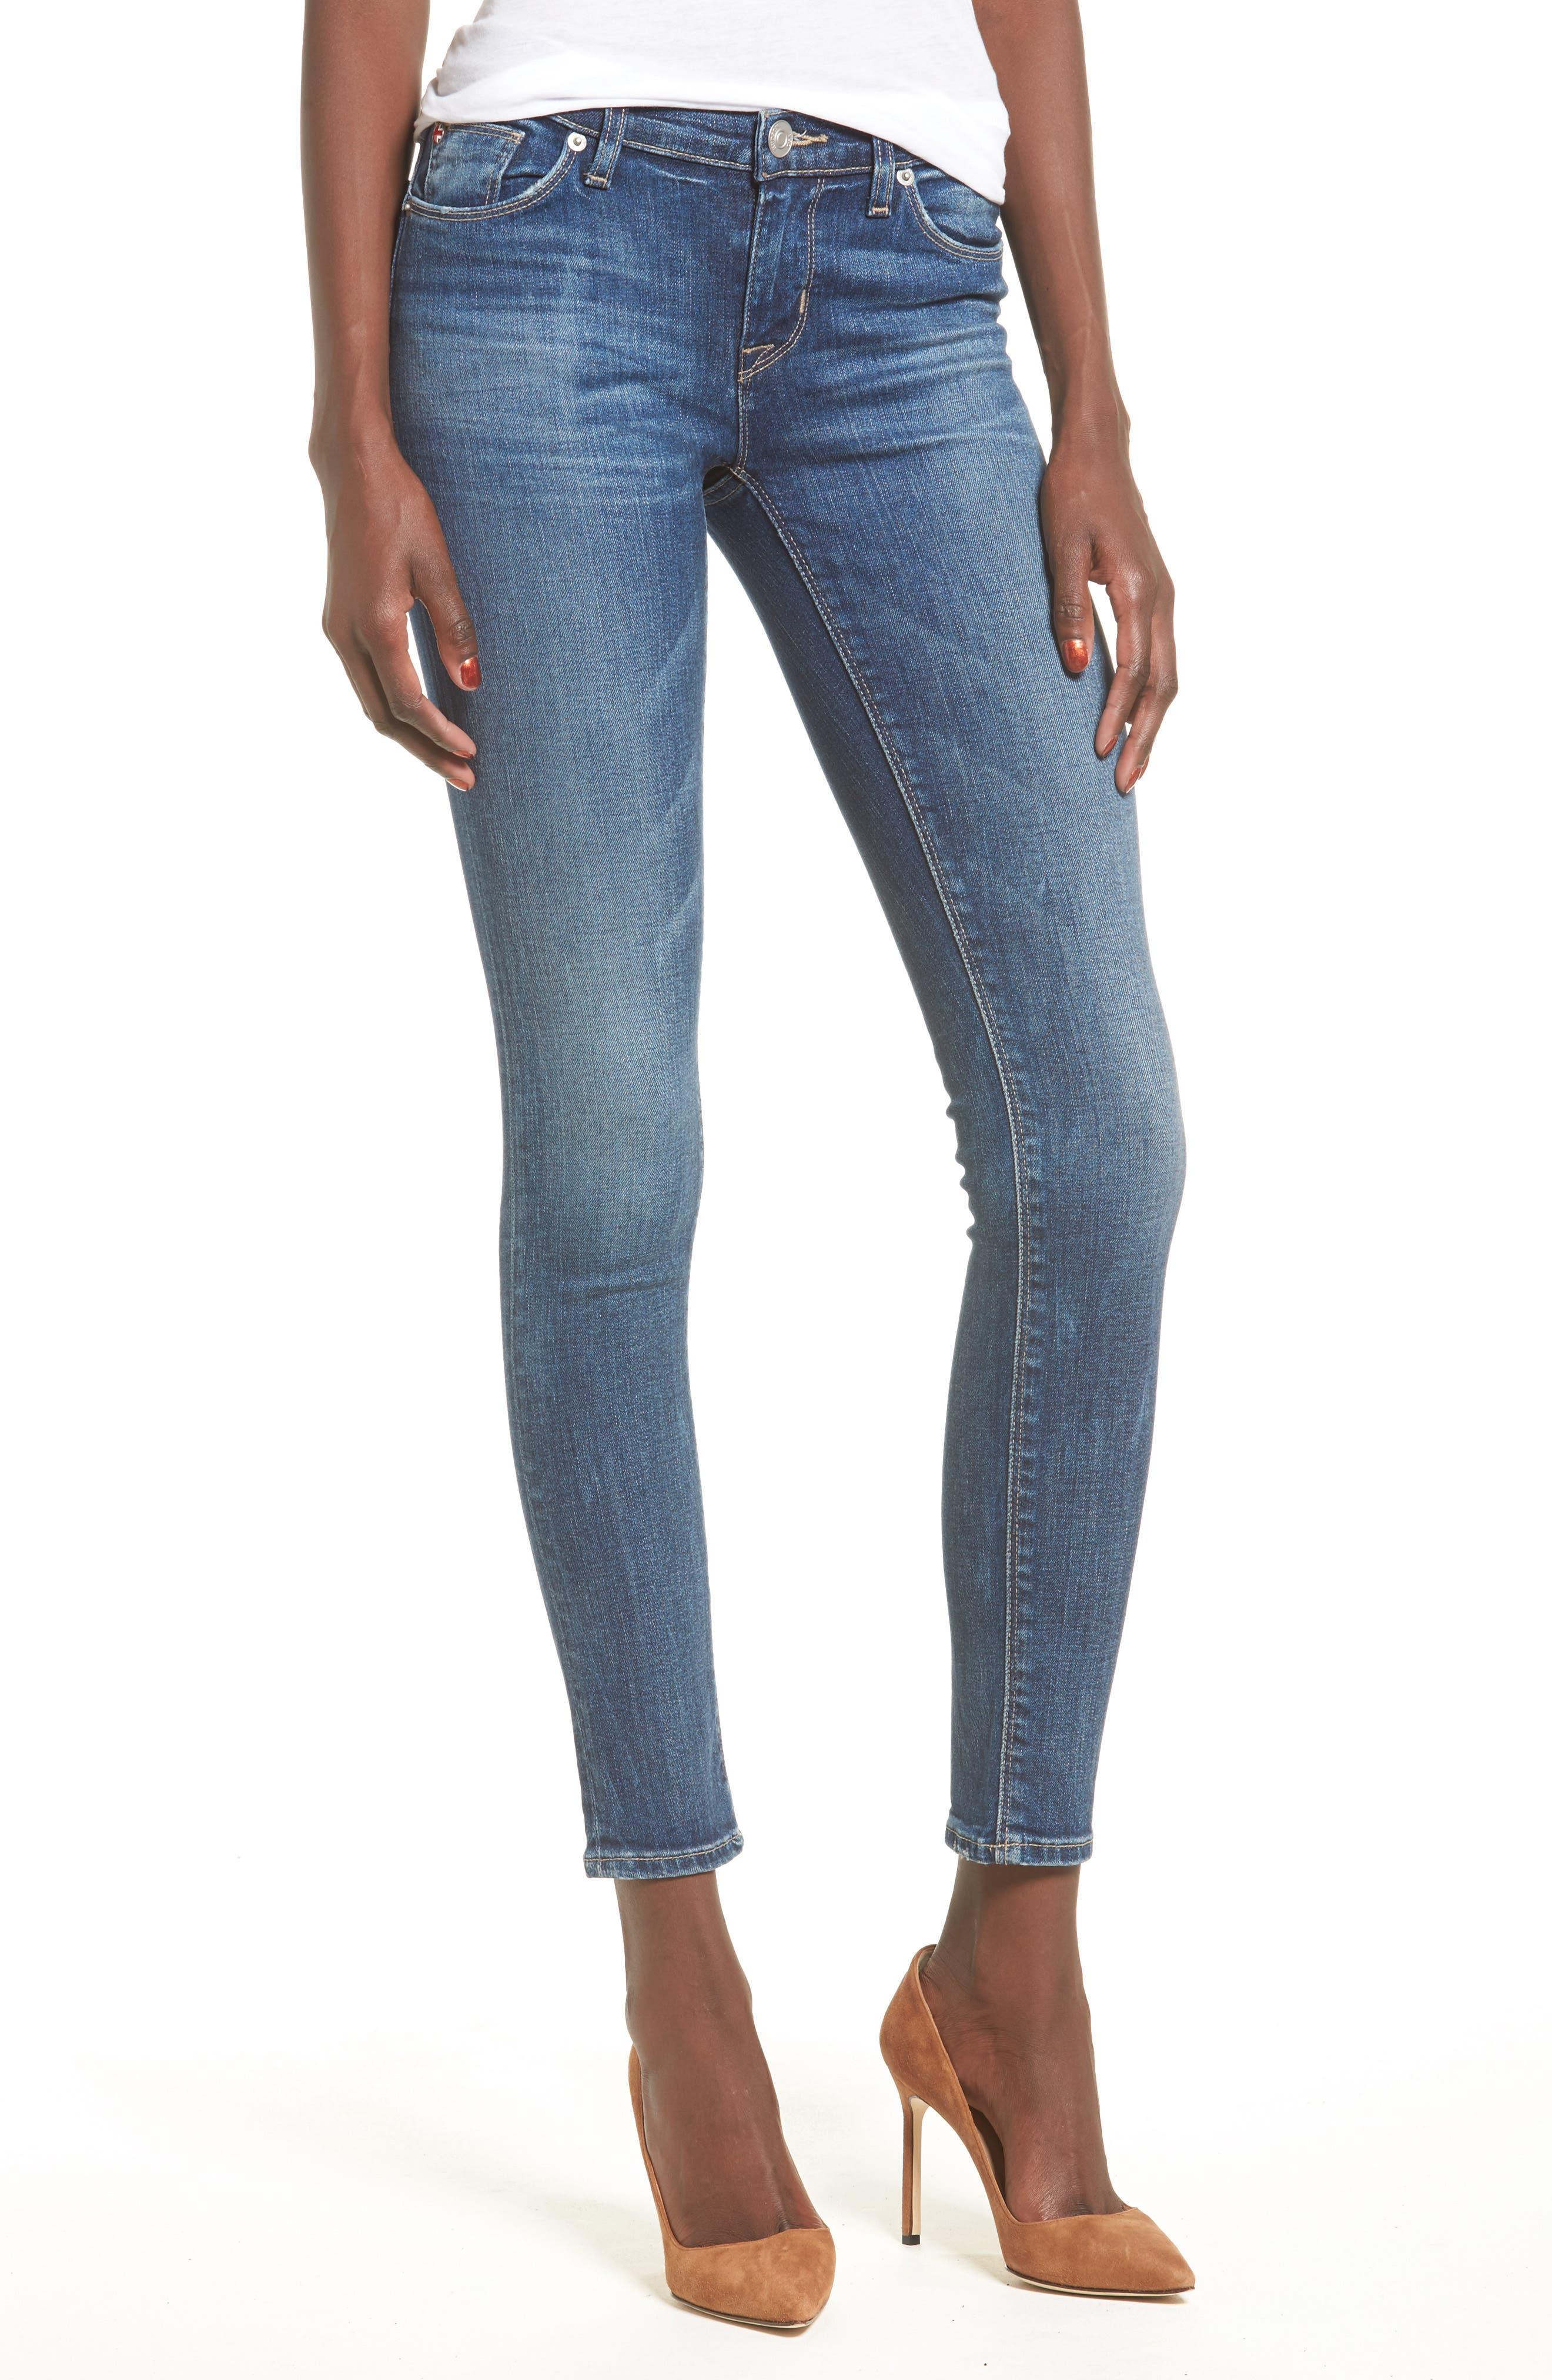 Alternate Image 1 Selected - Hudson Jeans 'Krista' Super Skinny Jeans (Solo)